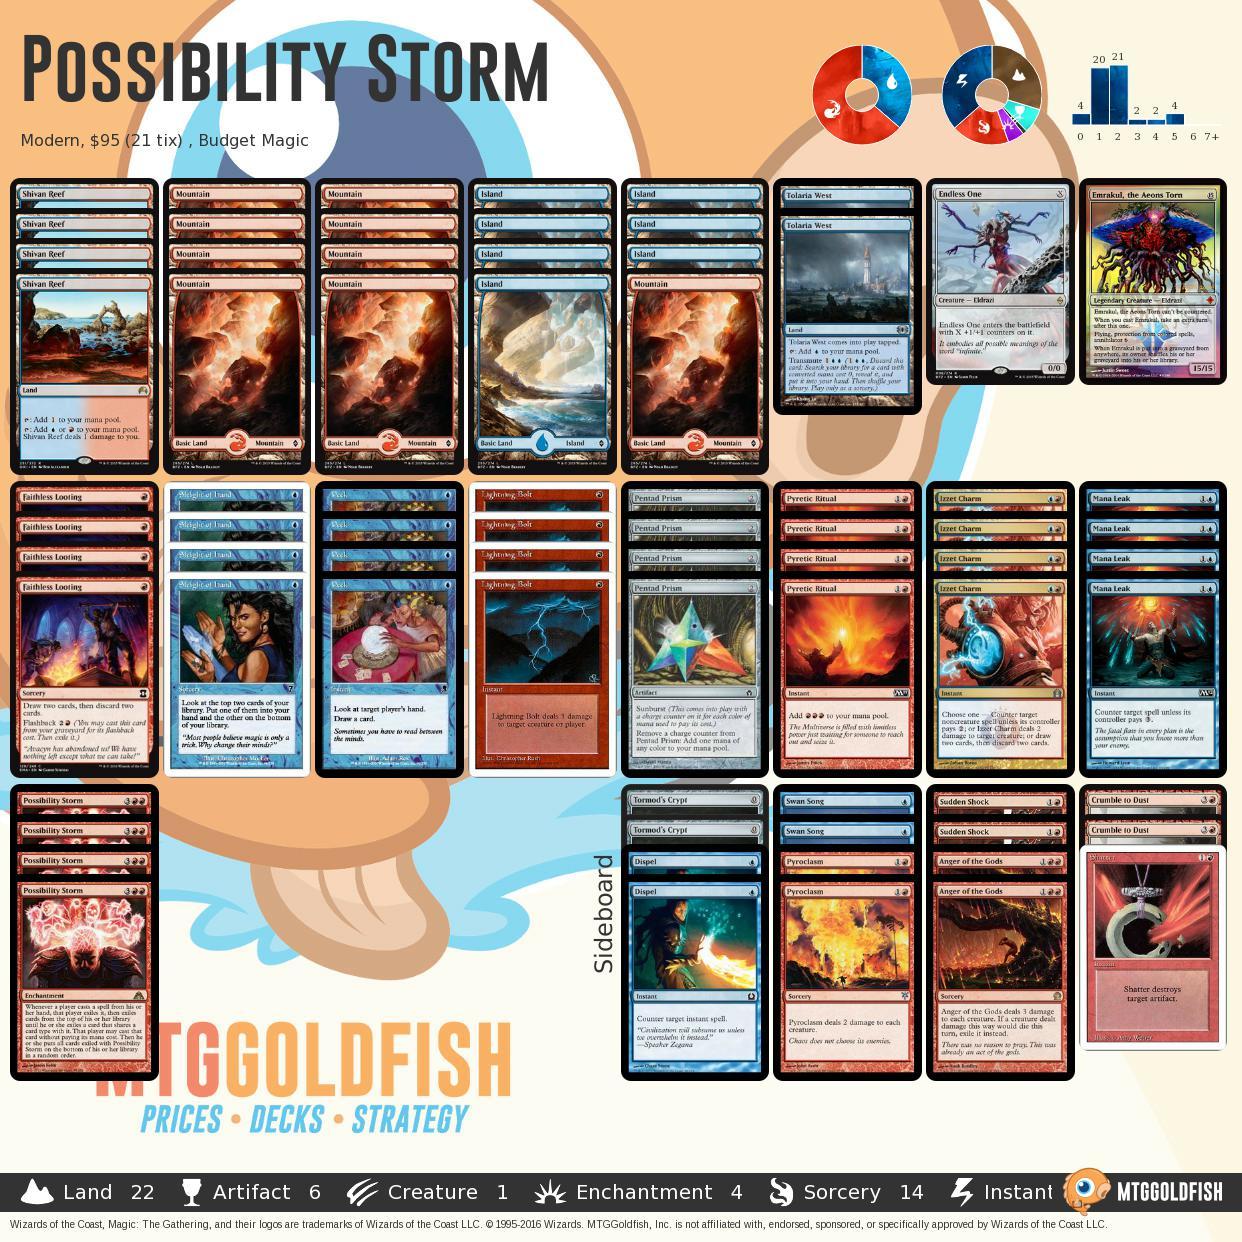 Possibilitystorm